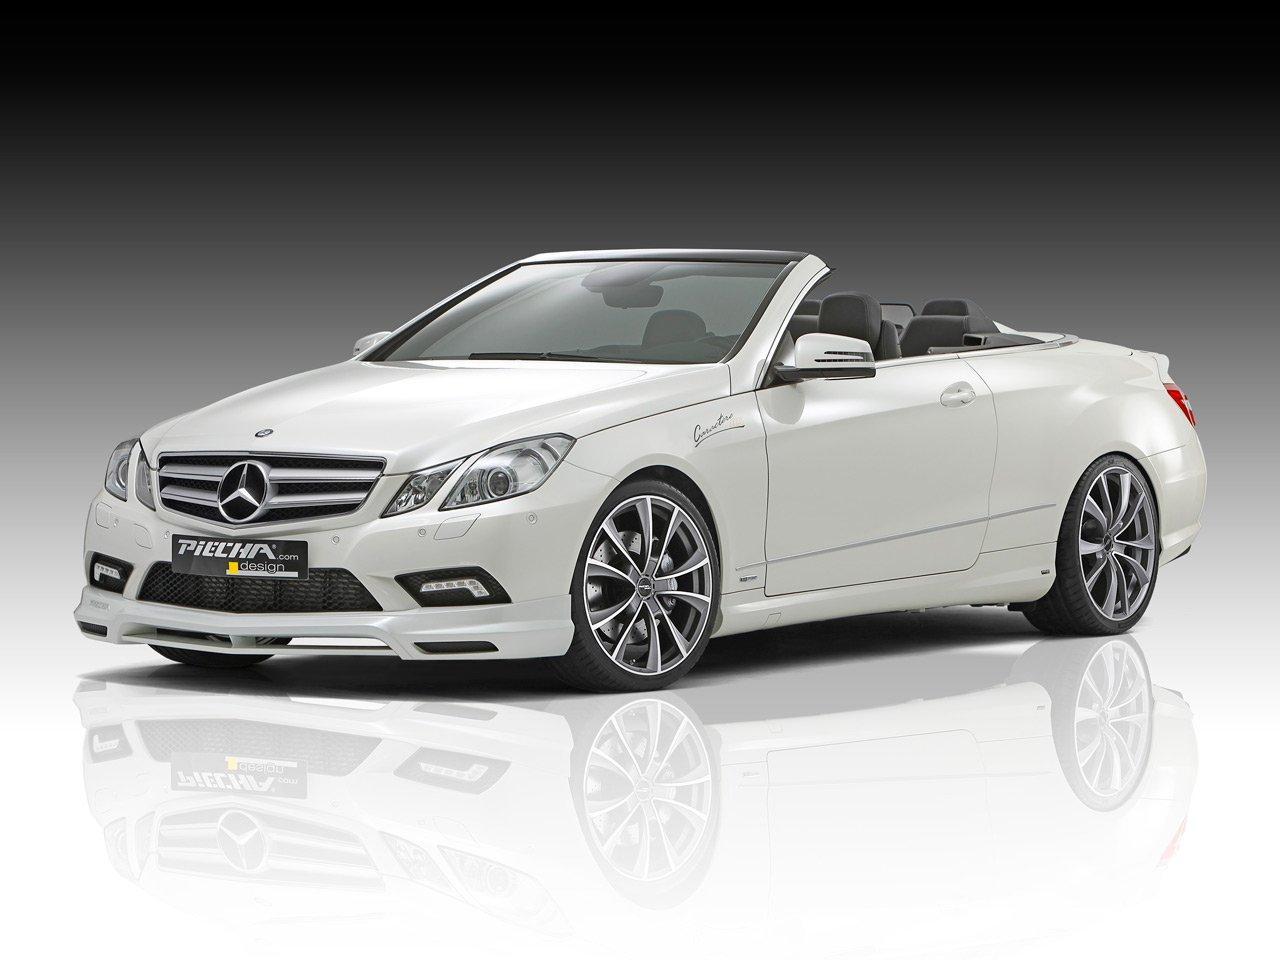 Piecha Design prepares Mercedes E-Class tuning